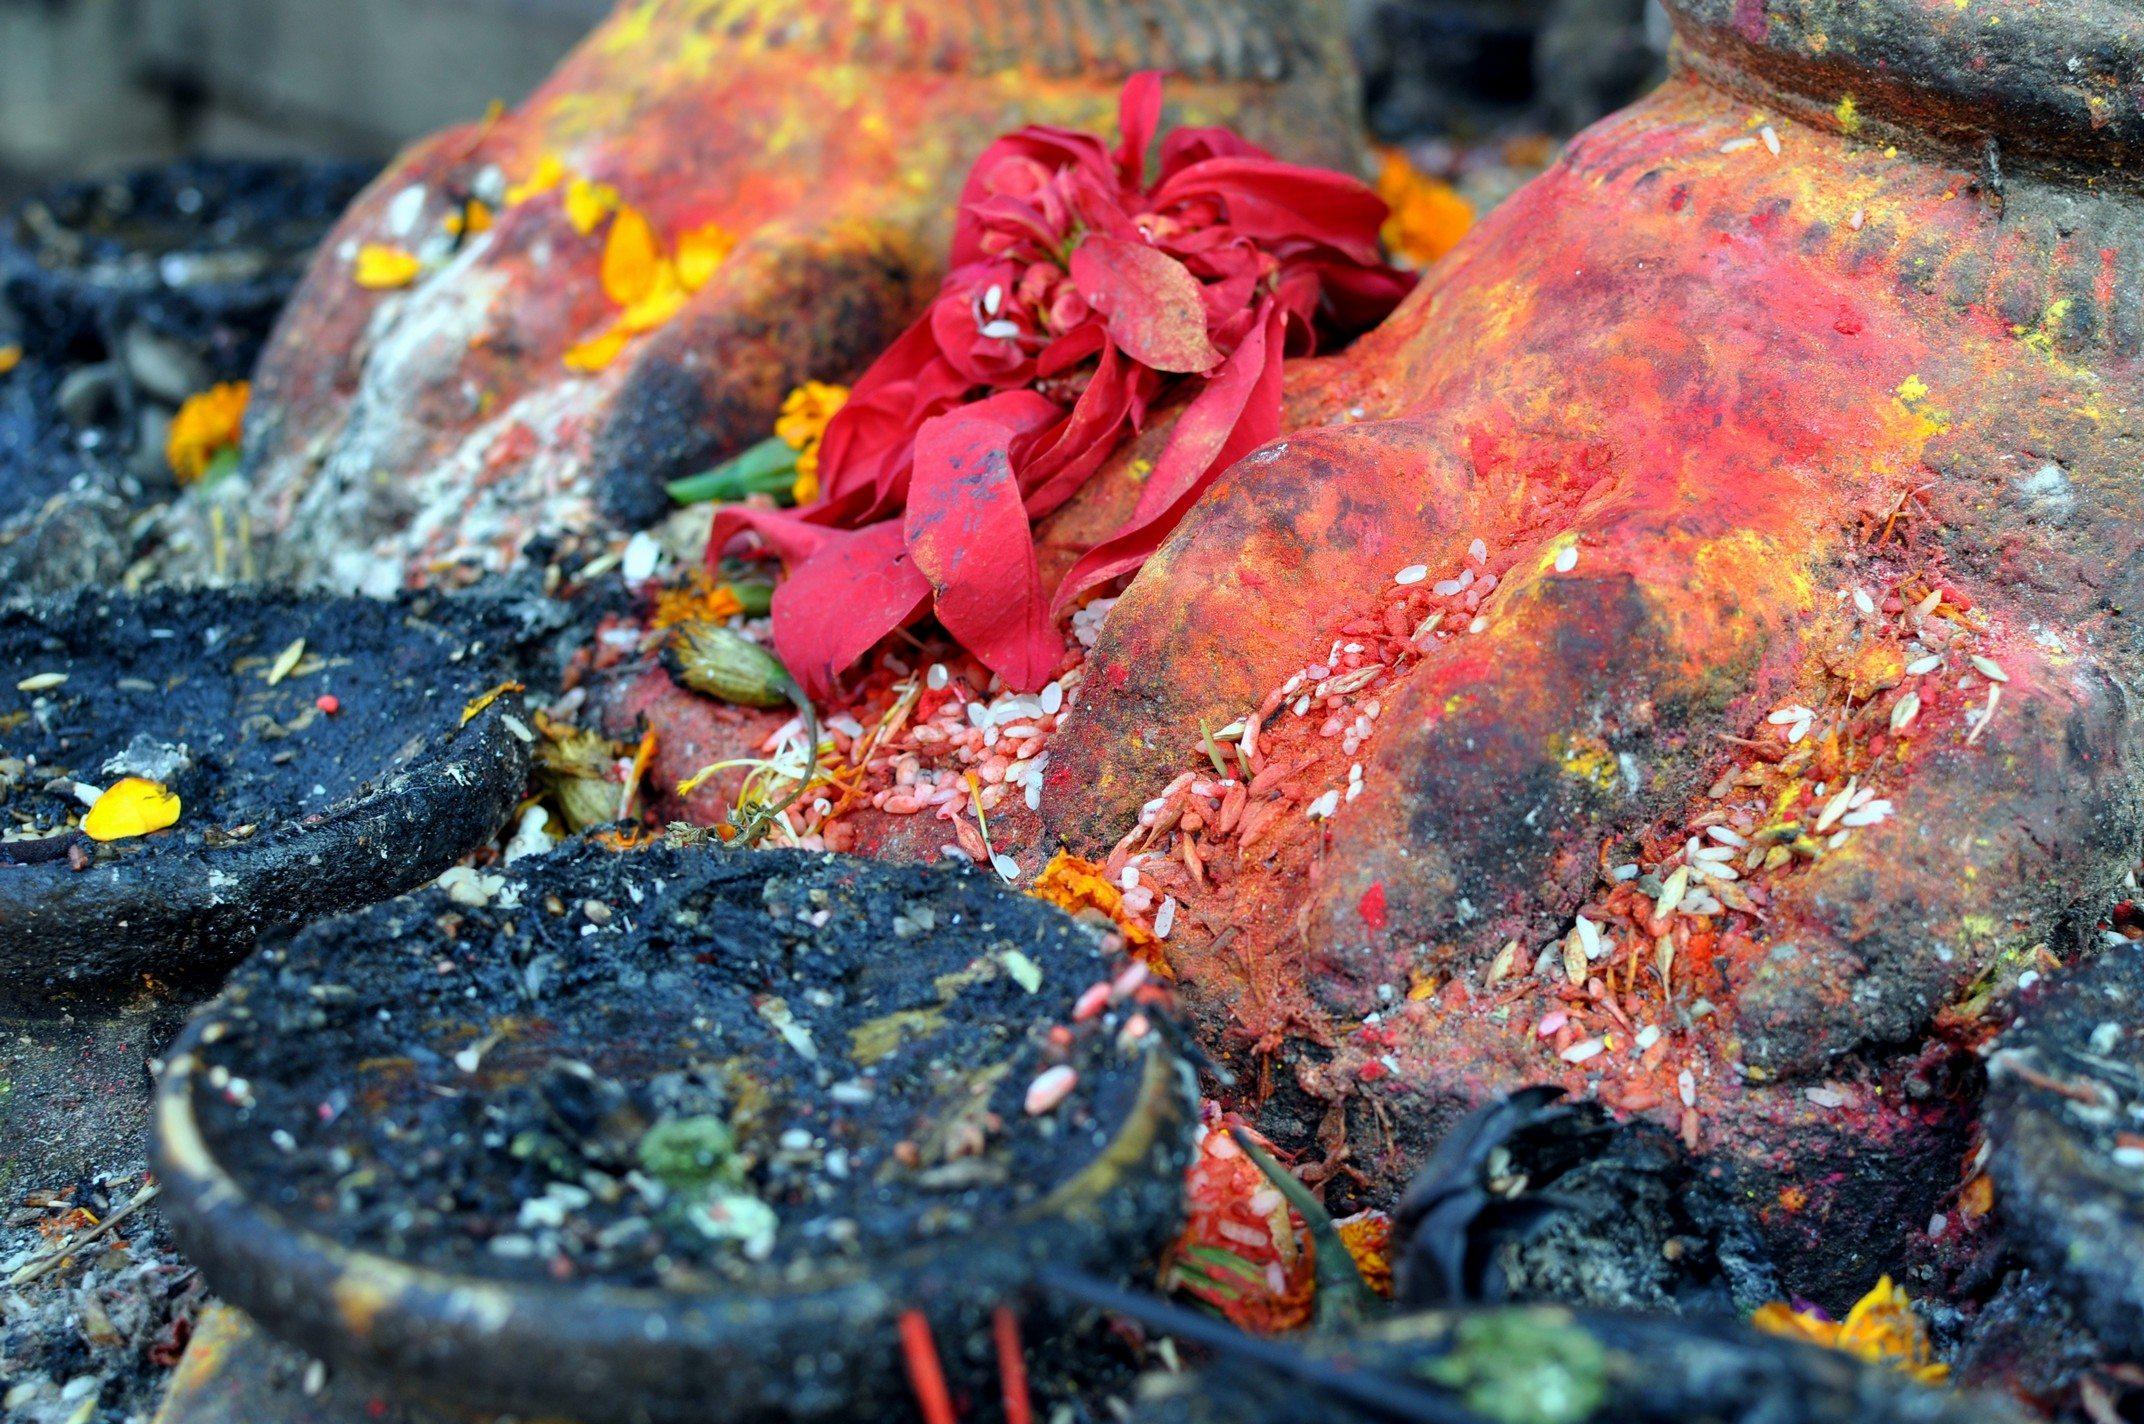 Vallée de Katmandou - Temple de Changu Narayan, offrandes